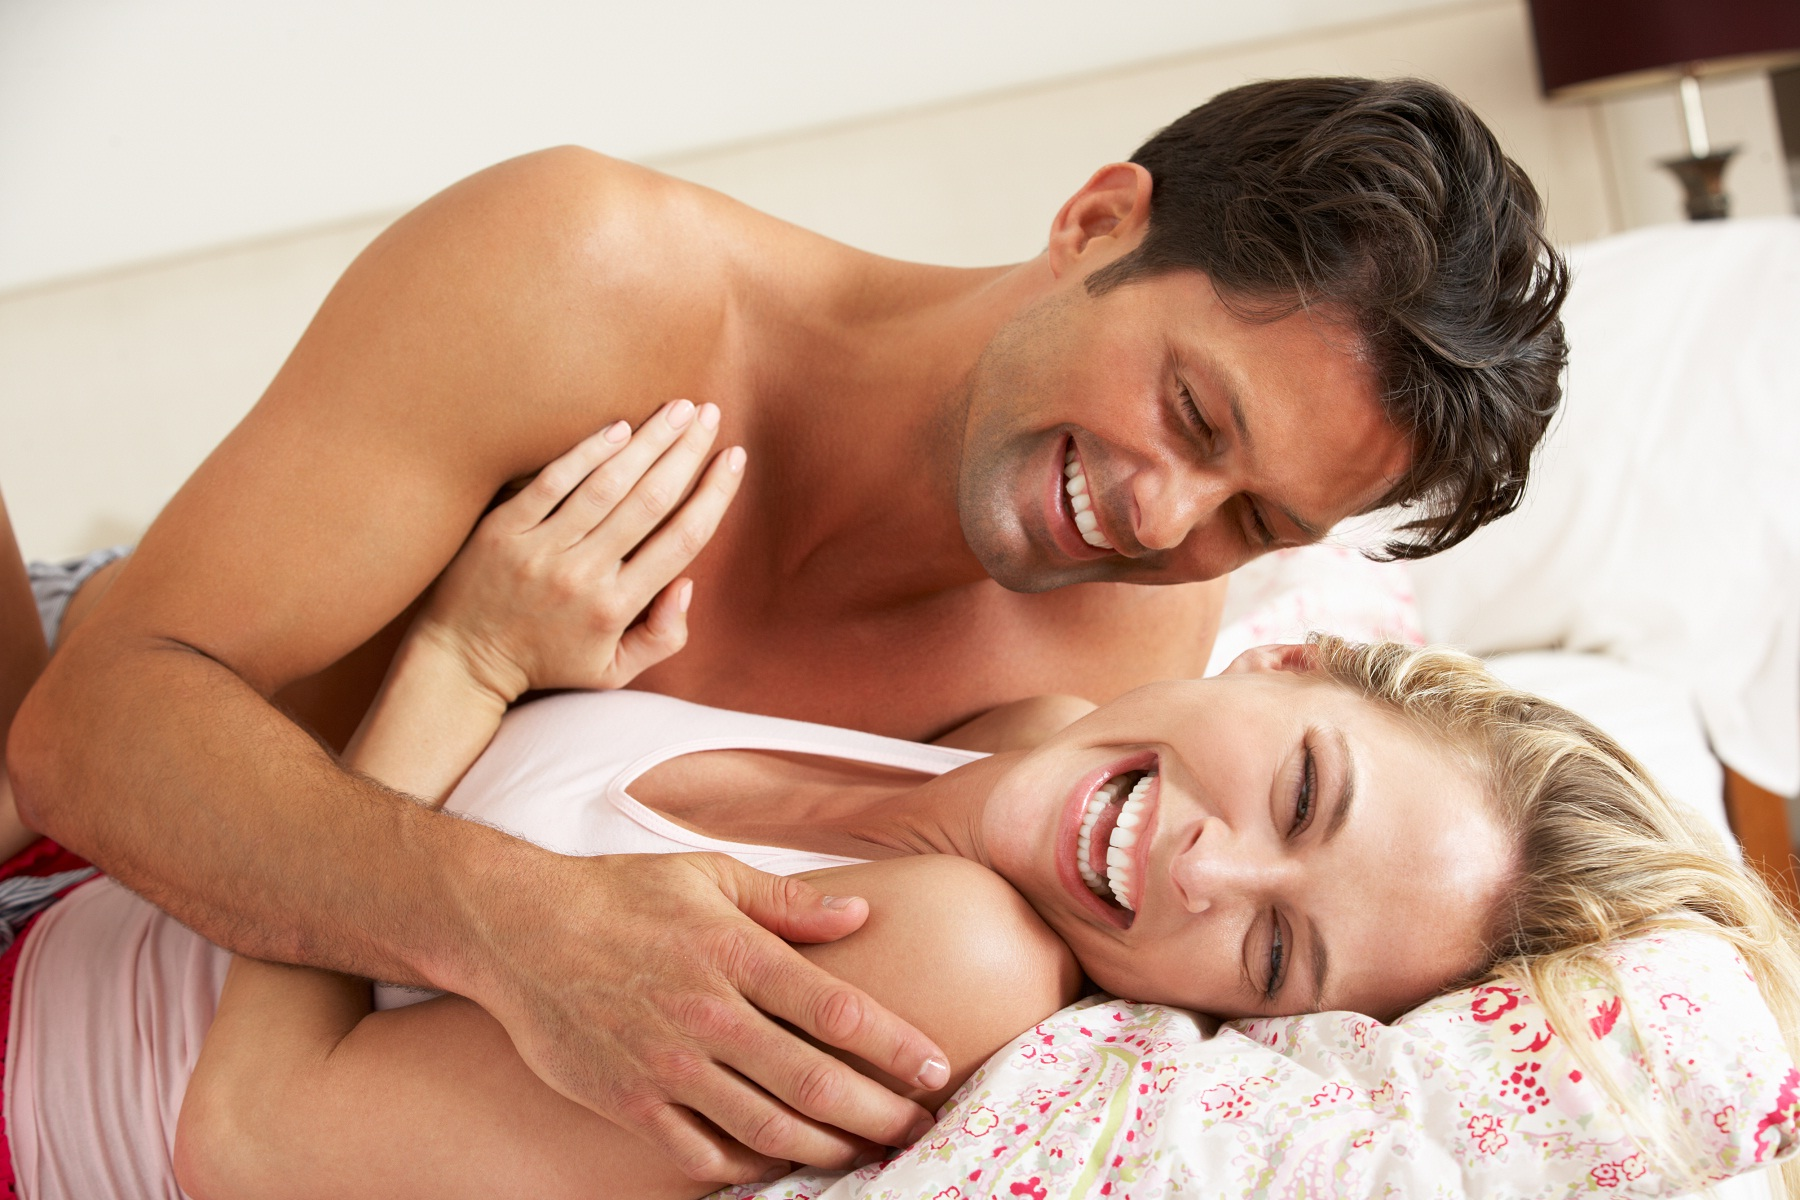 Most romantic bedroom kisses - Best Couple Romance In Bedroom Best Couple Romance In Bedroom Http Www Kingsizemaleenhancements